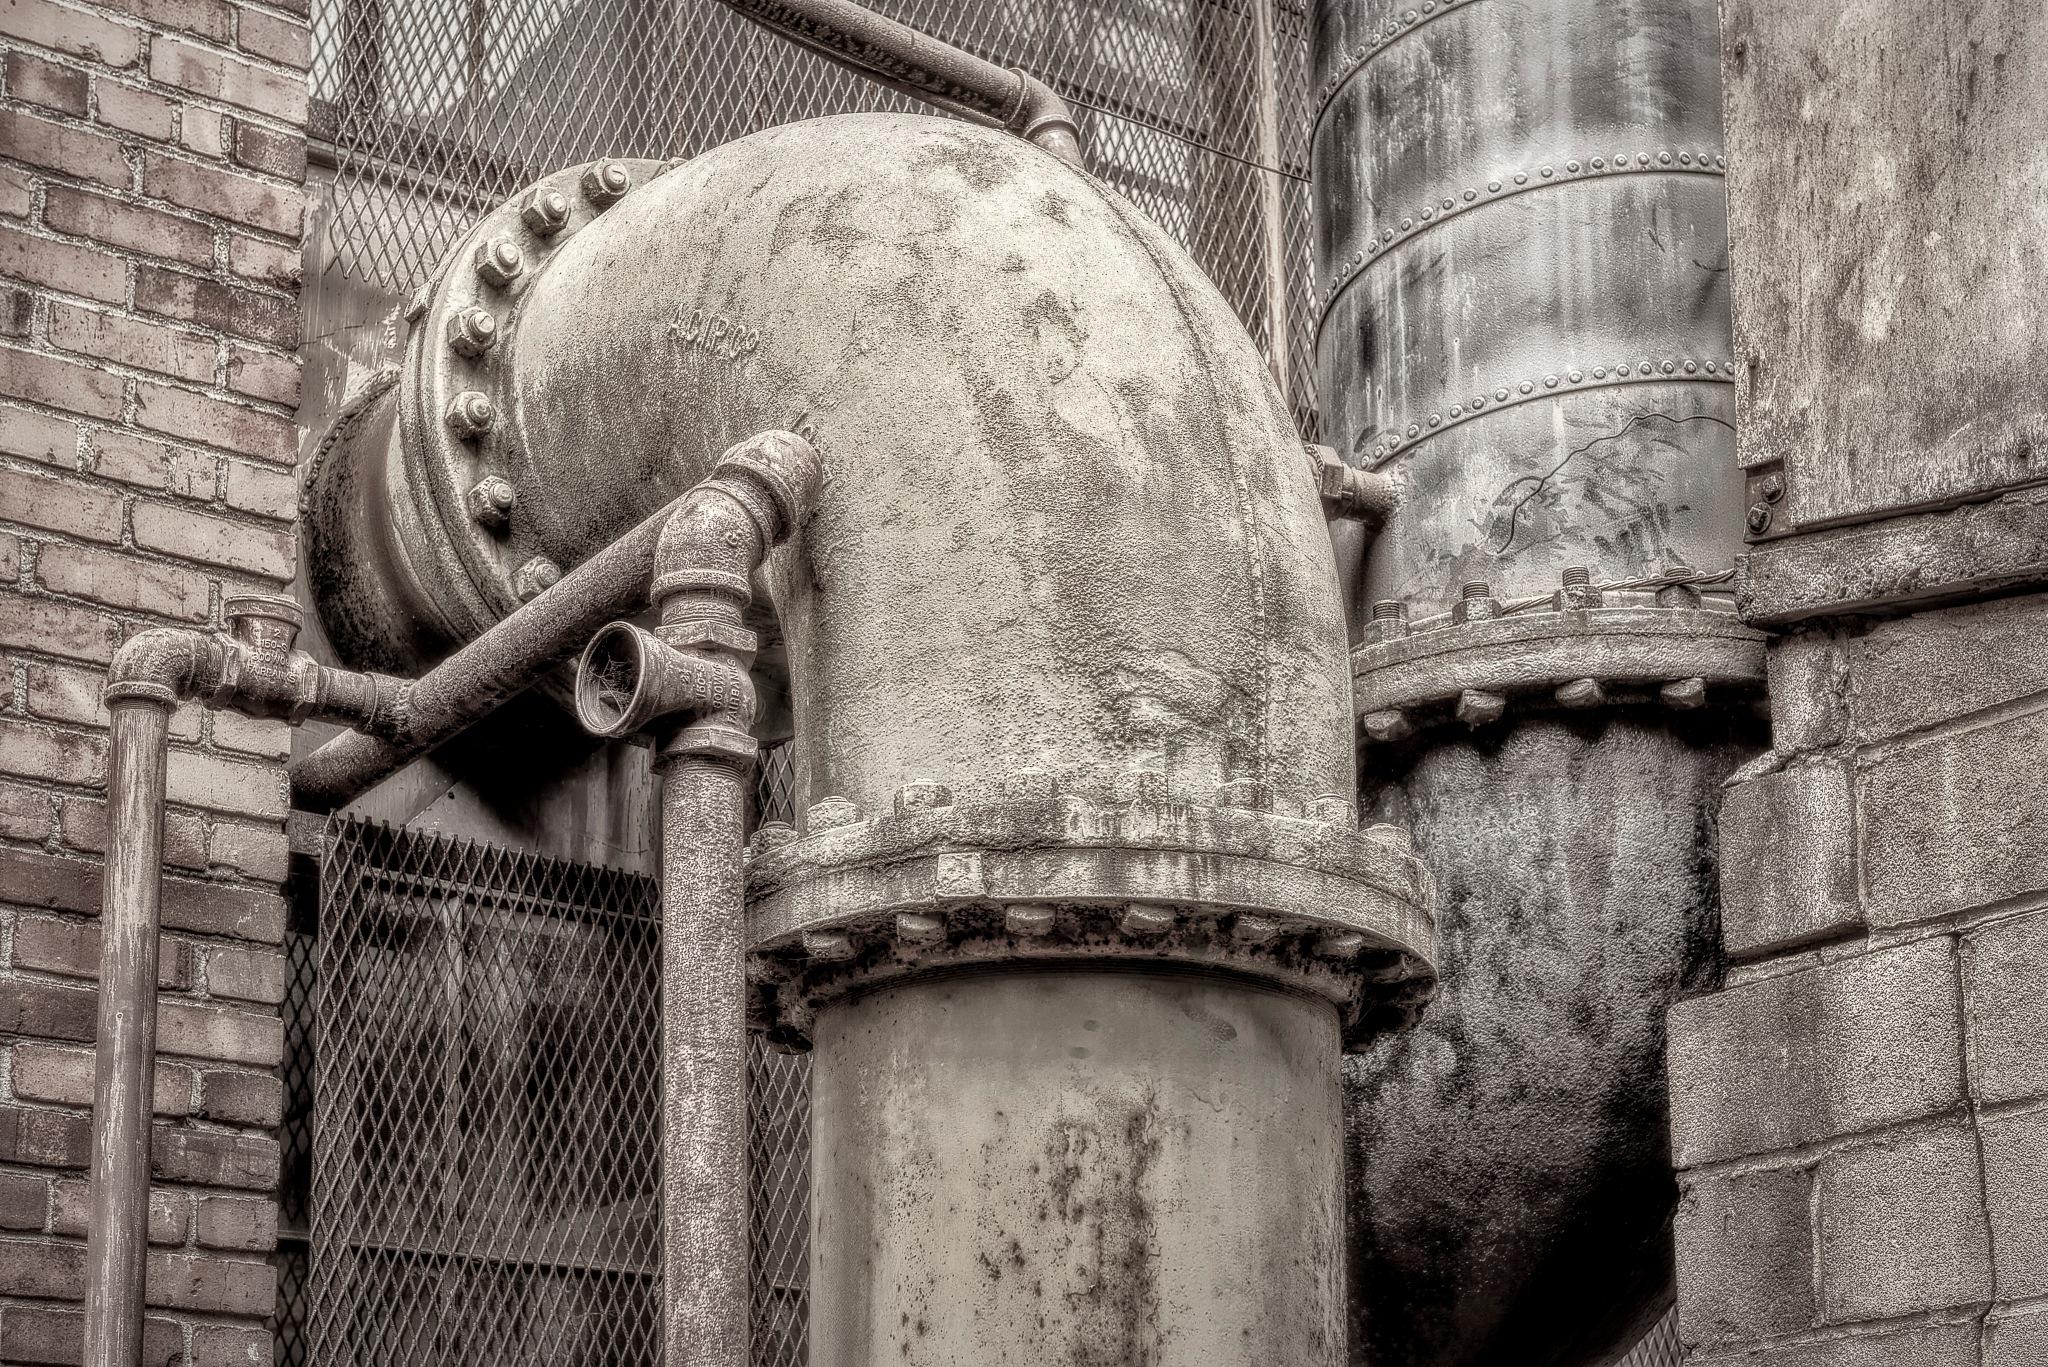 industrial #33 by Gerry Daniel